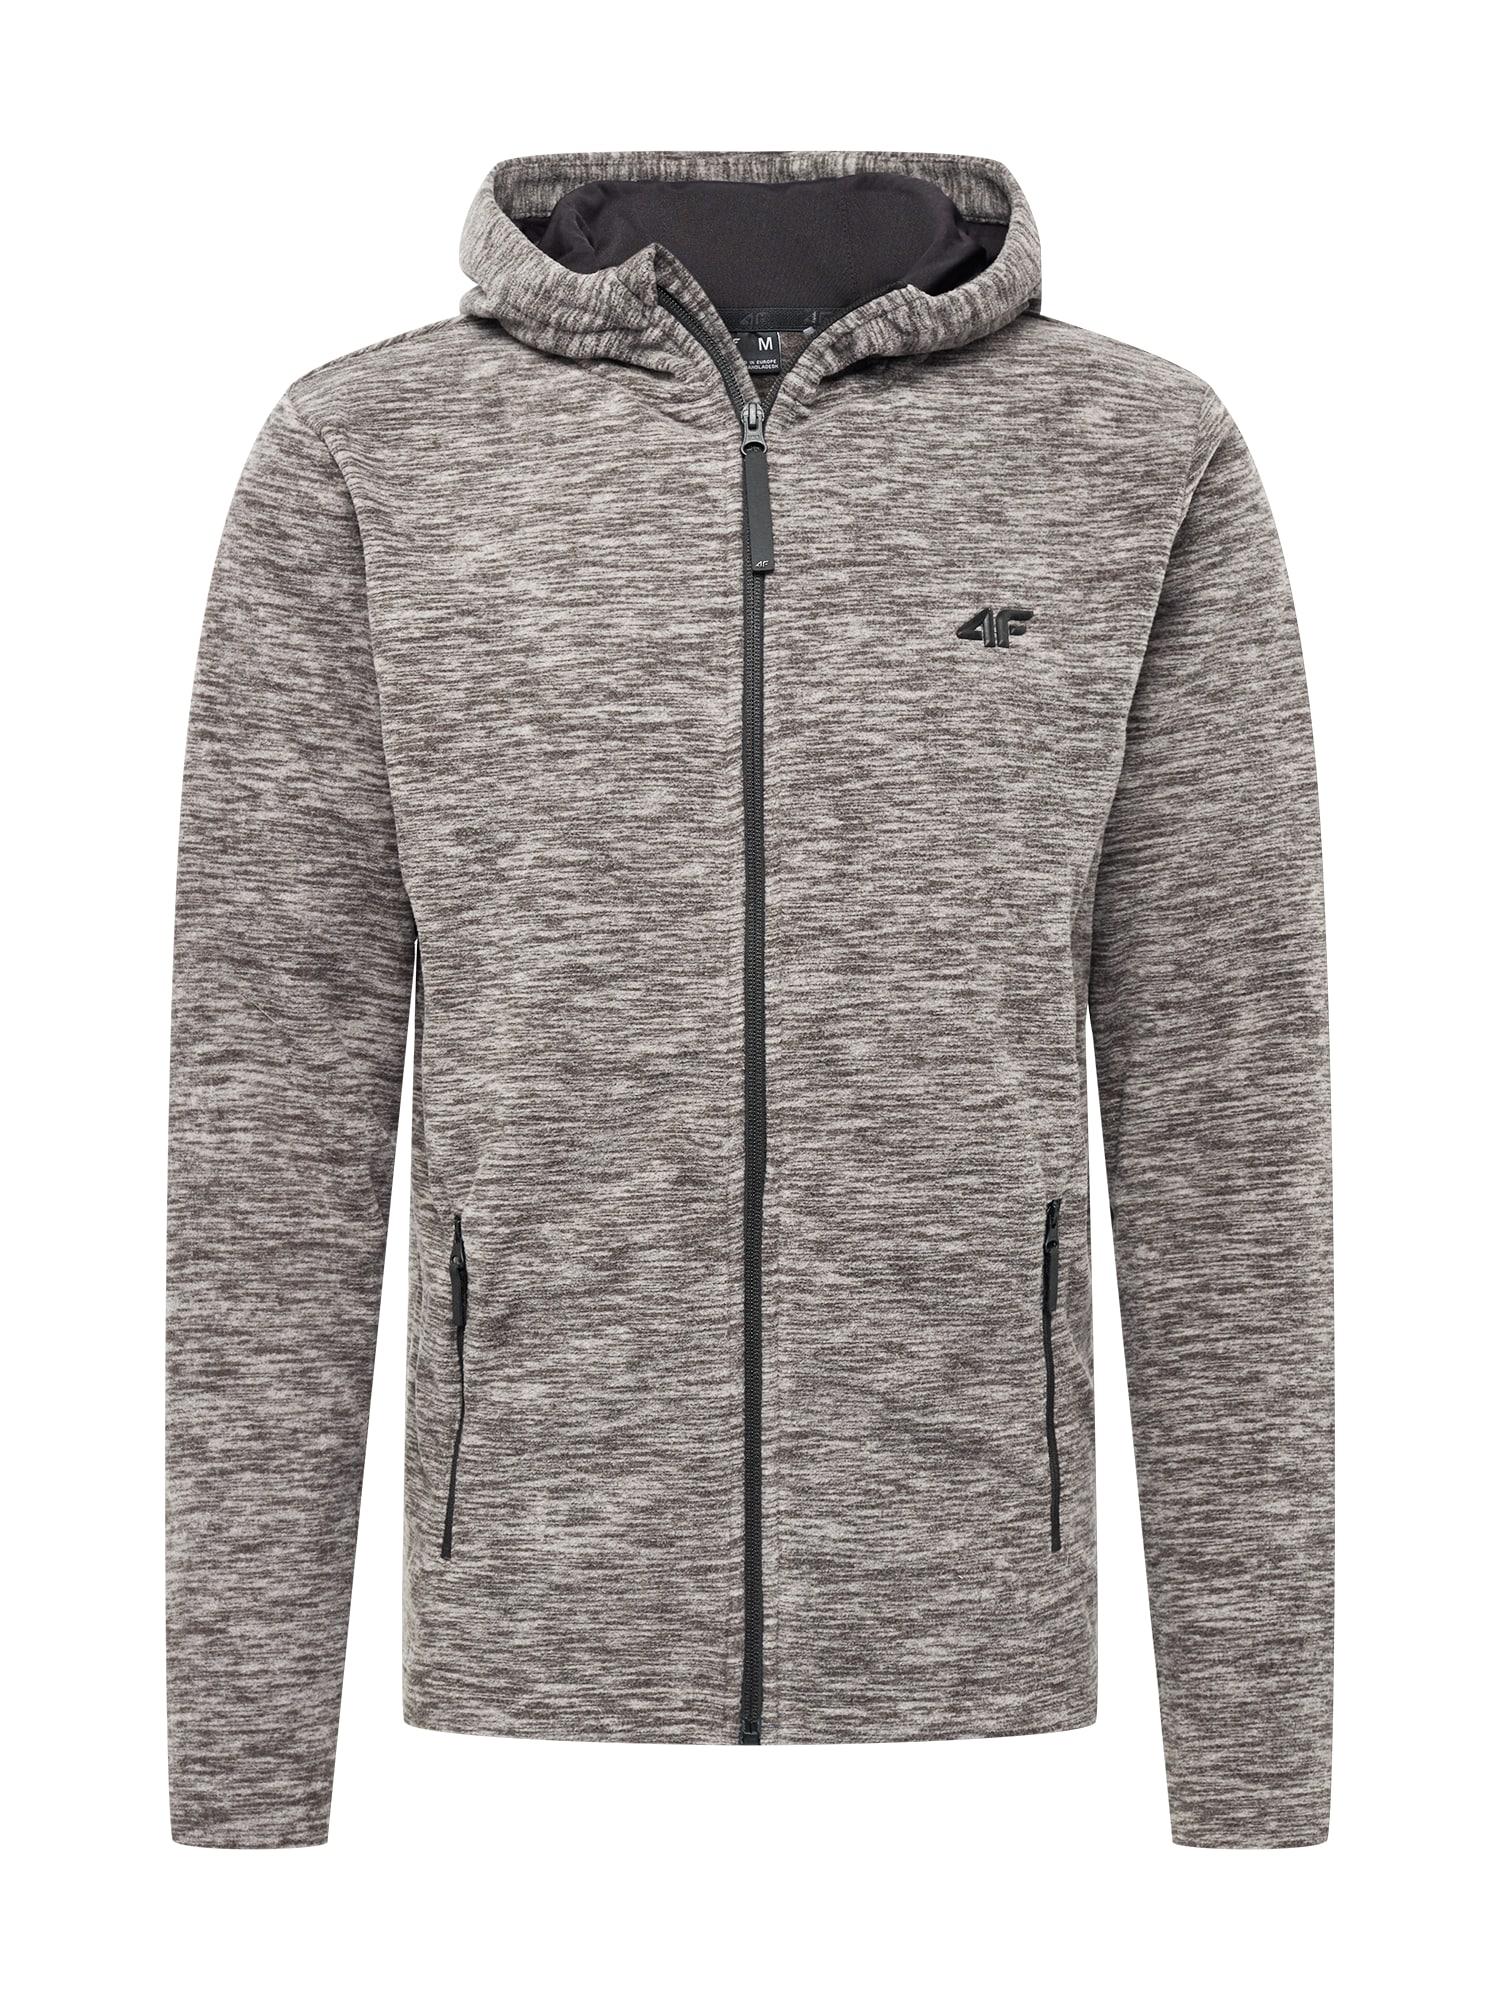 4F Funkcinis flisinis džemperis margai pilka / marga smėlio spalva